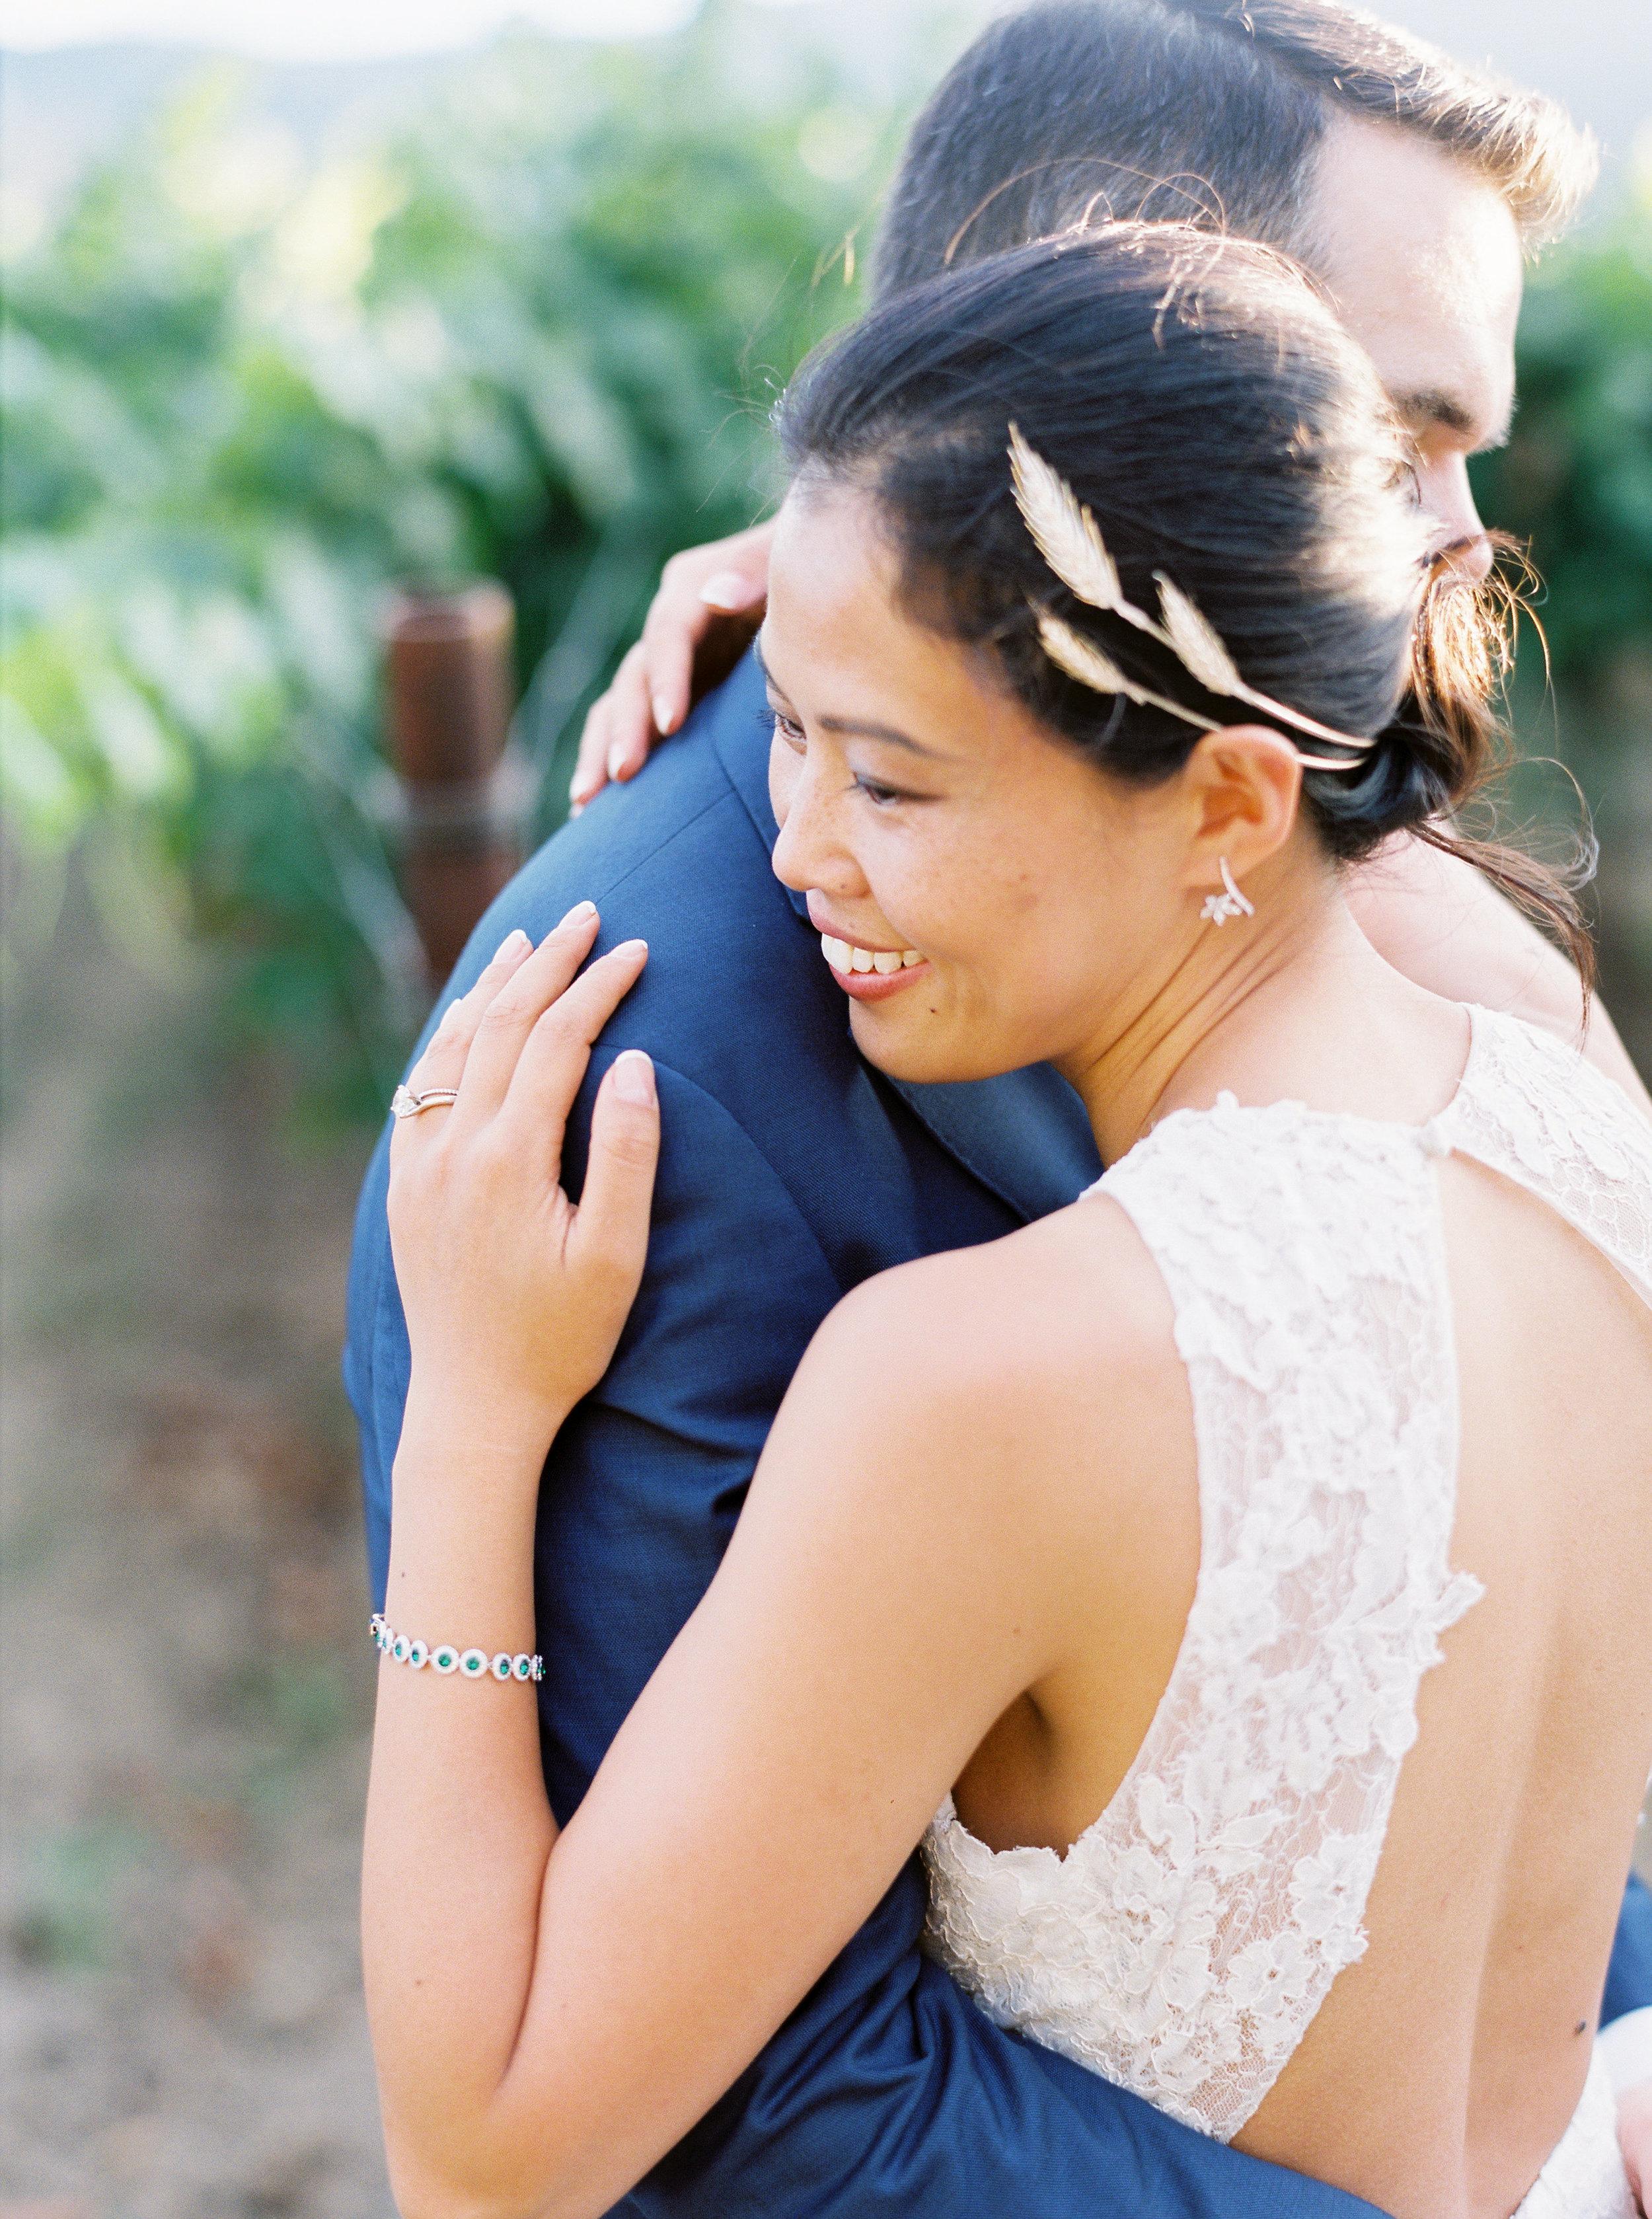 Harvest-inn-wedding-in-napa-california-116.jpg